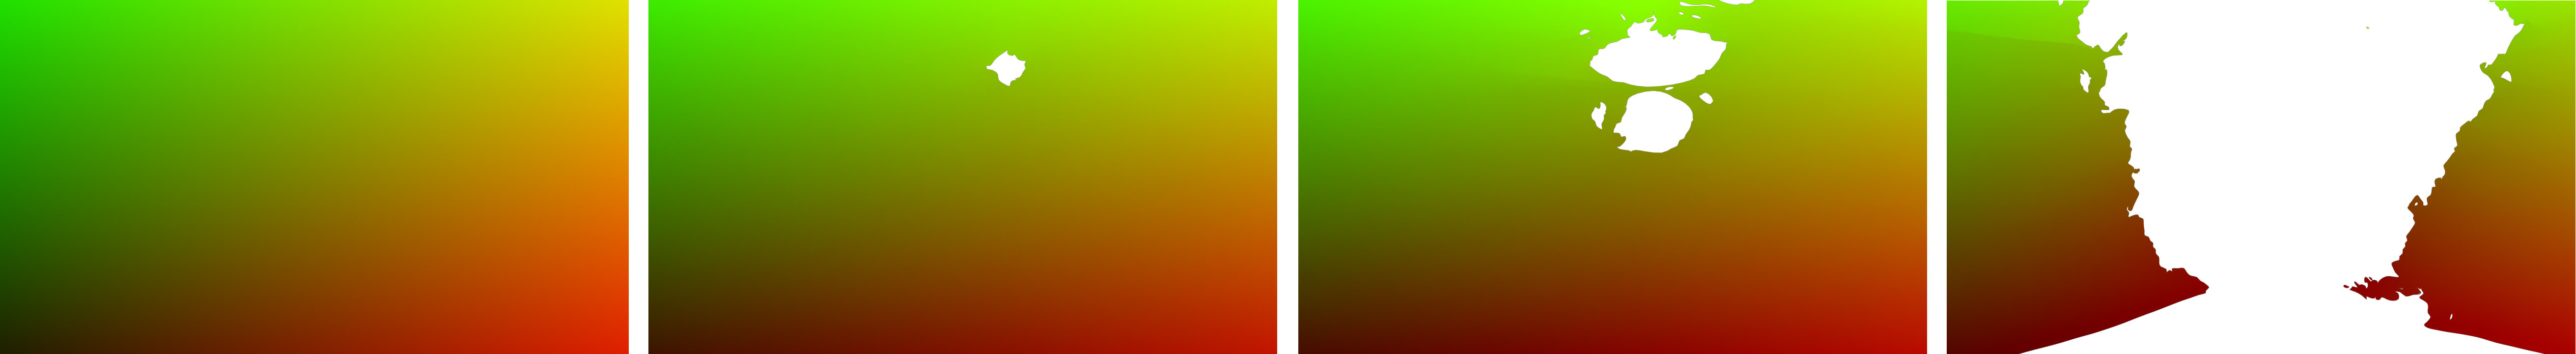 Tela Sequence Uv